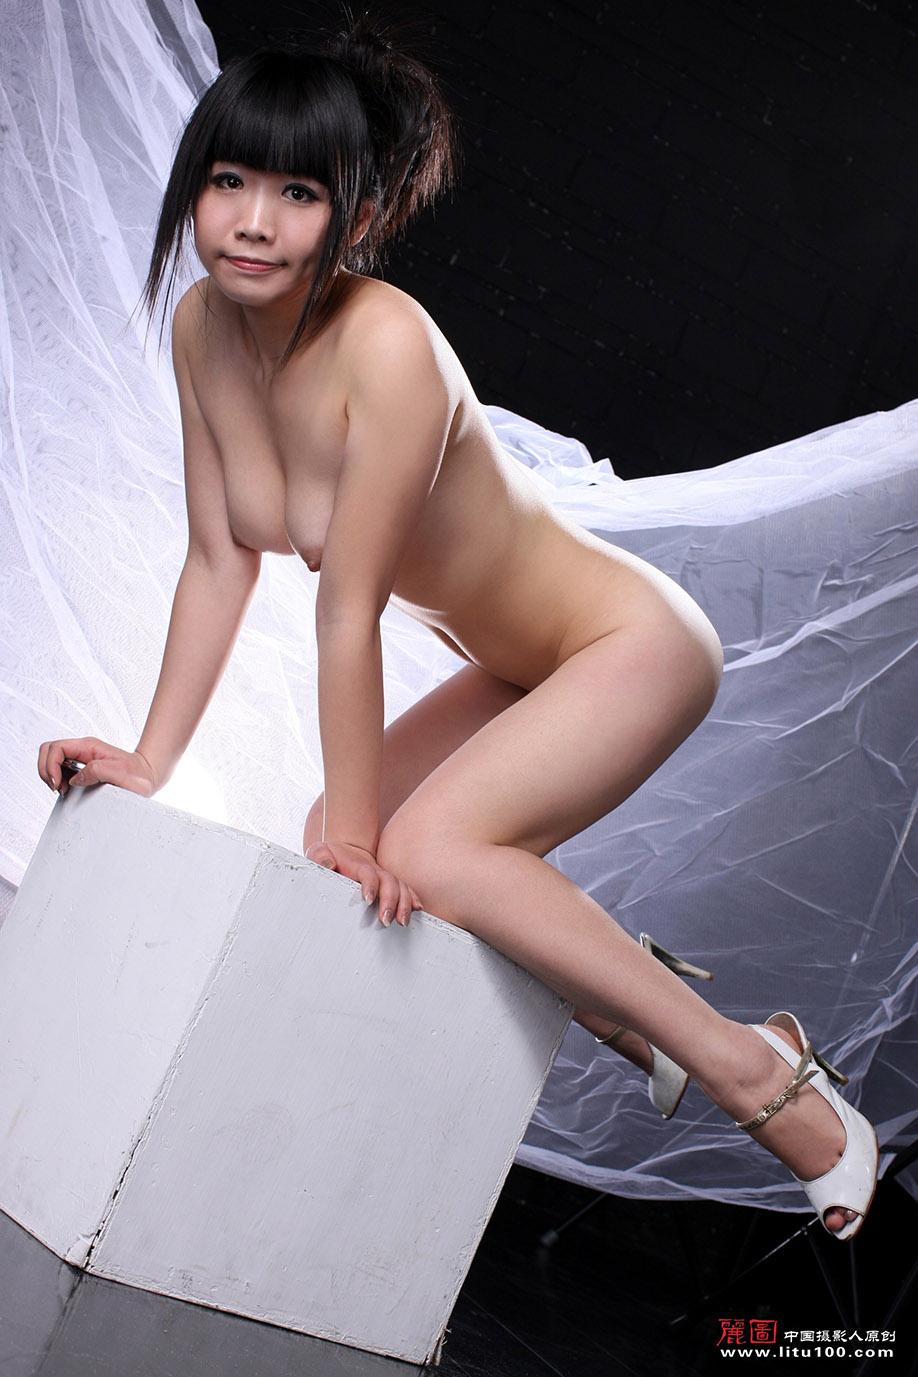 Hong kong artist nude porno image